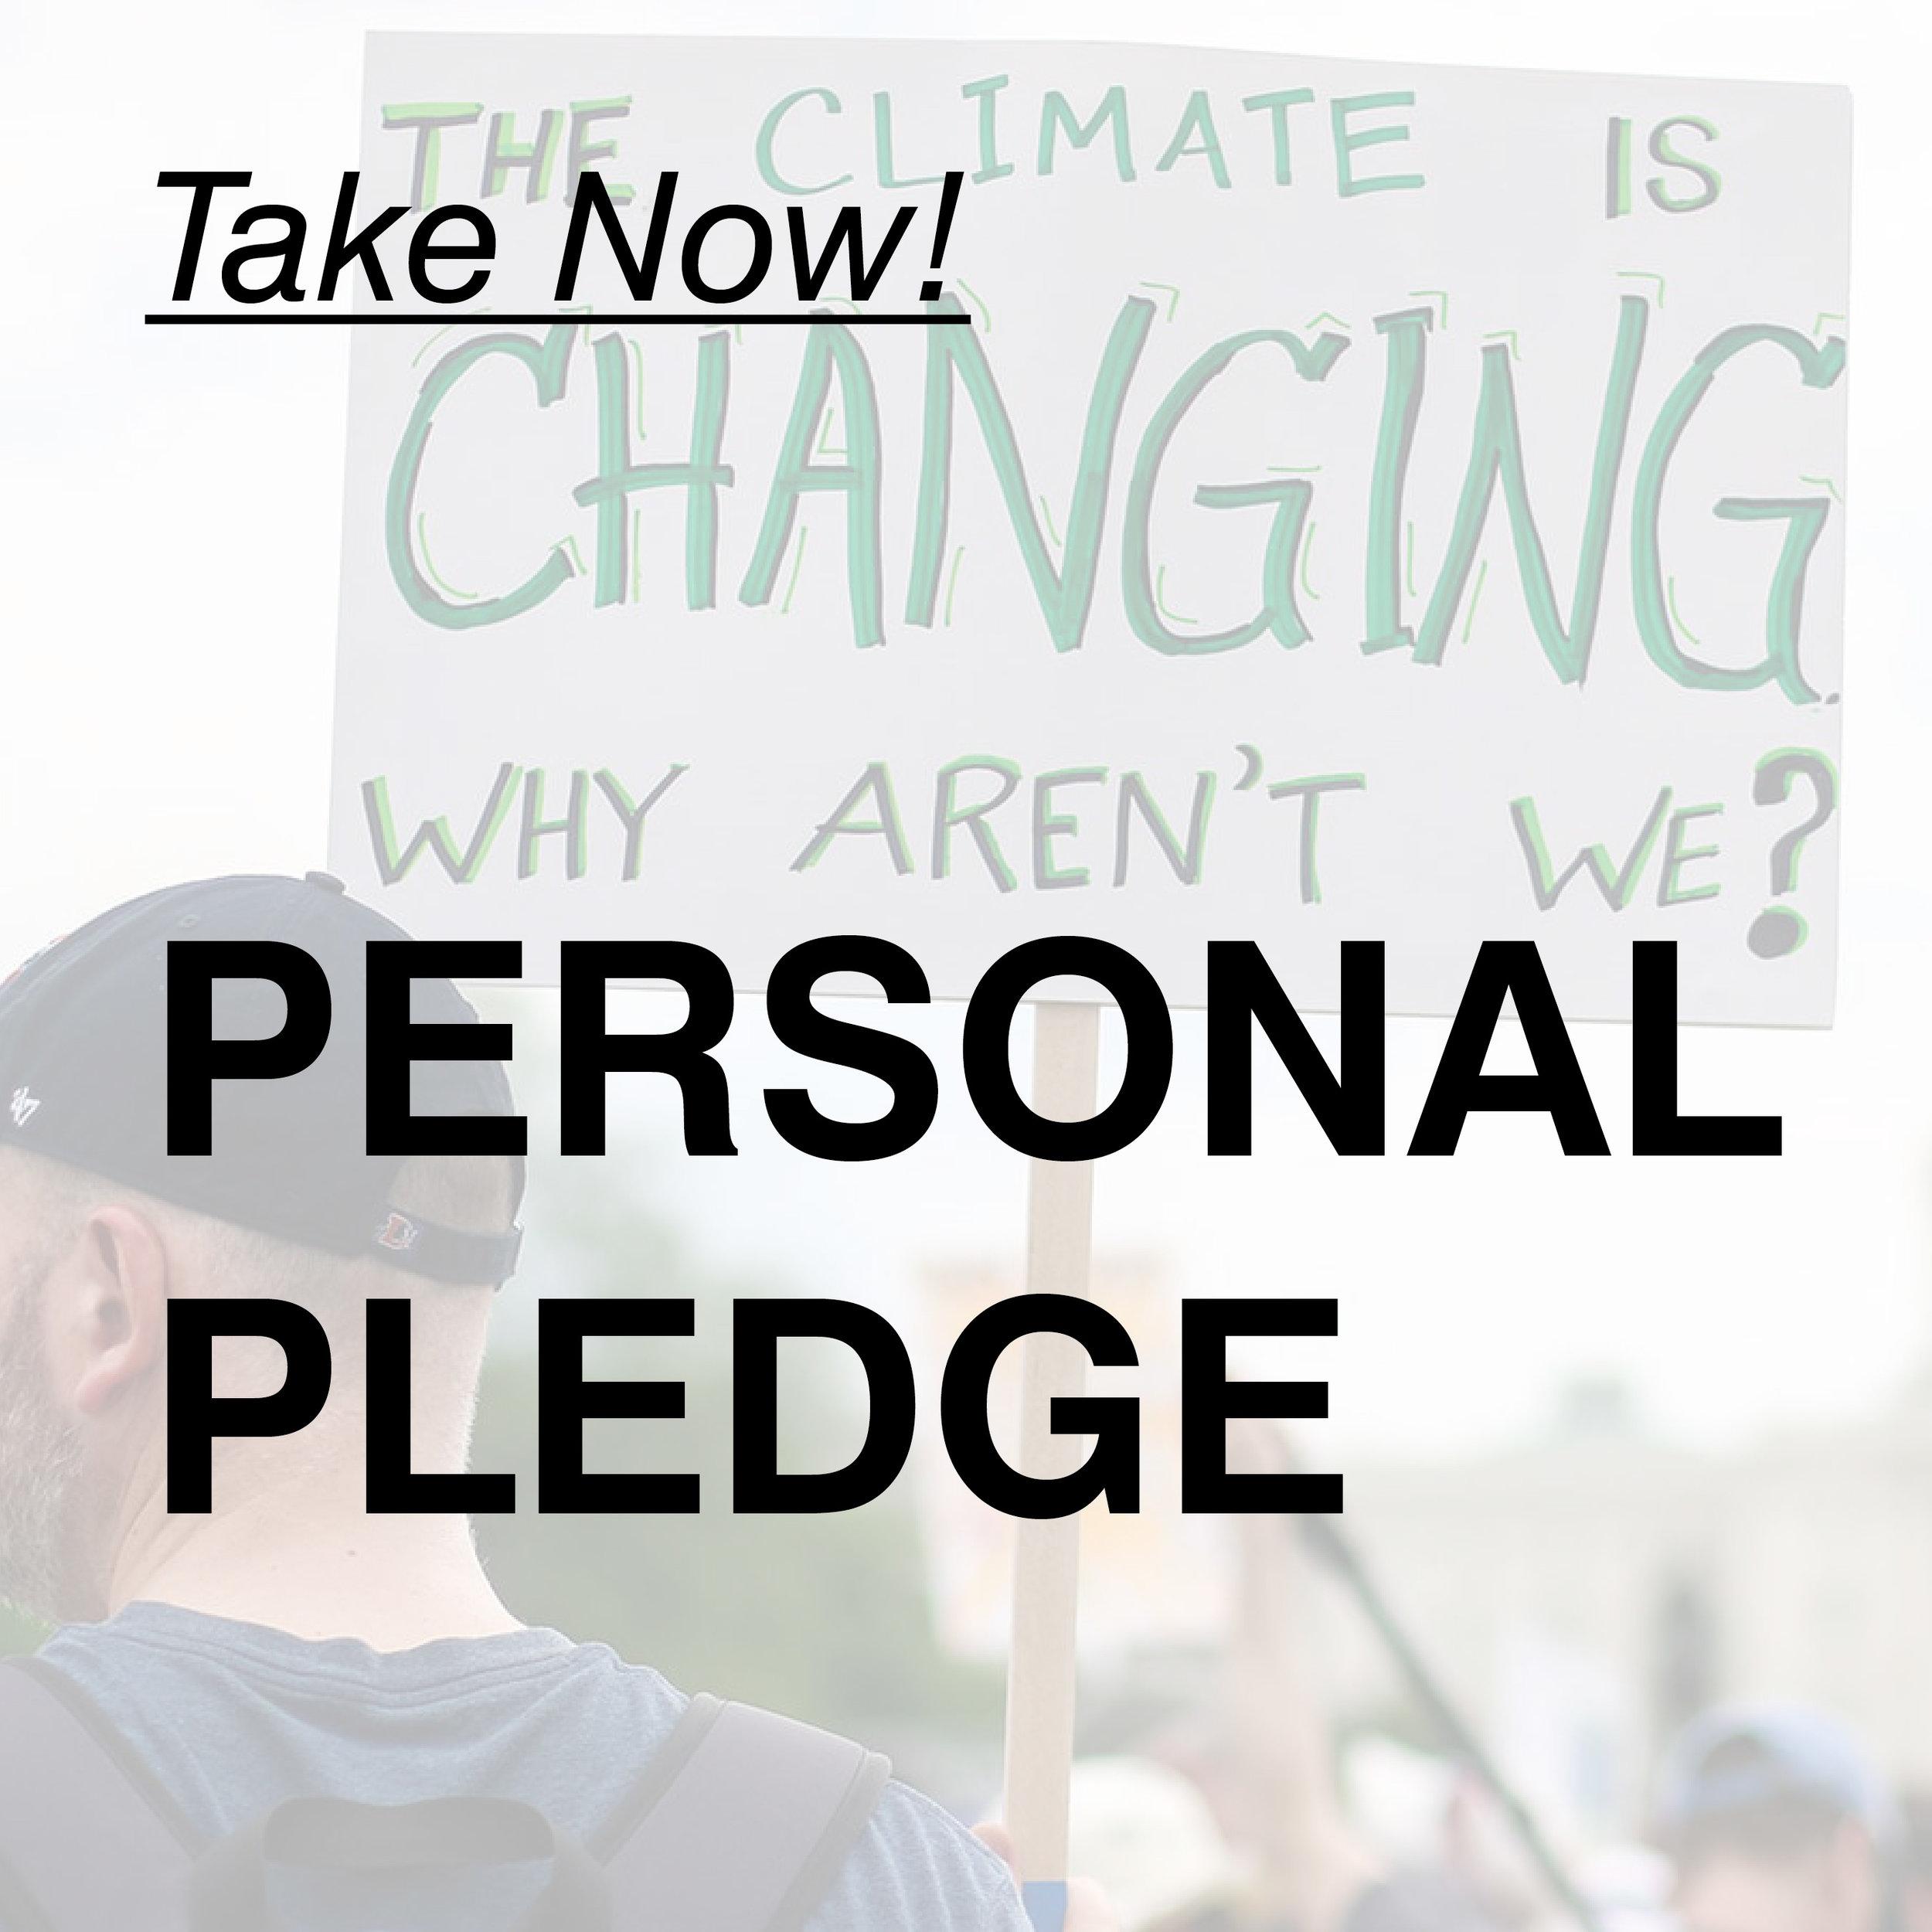 Pledge-01.jpg